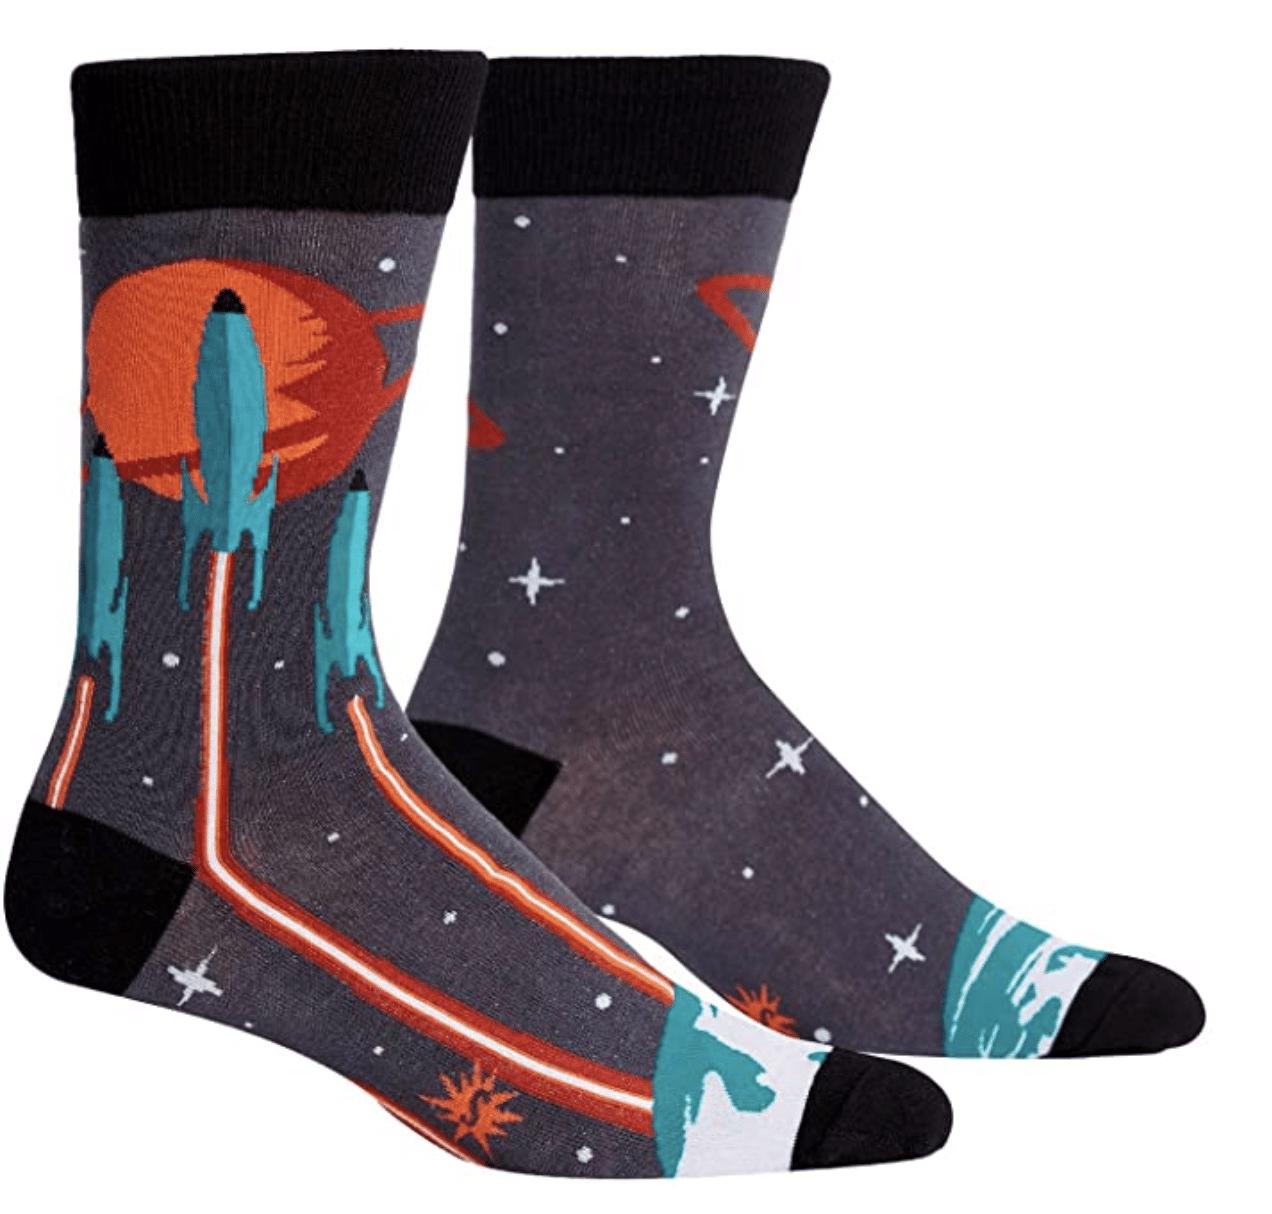 astronomy-gifts-socks